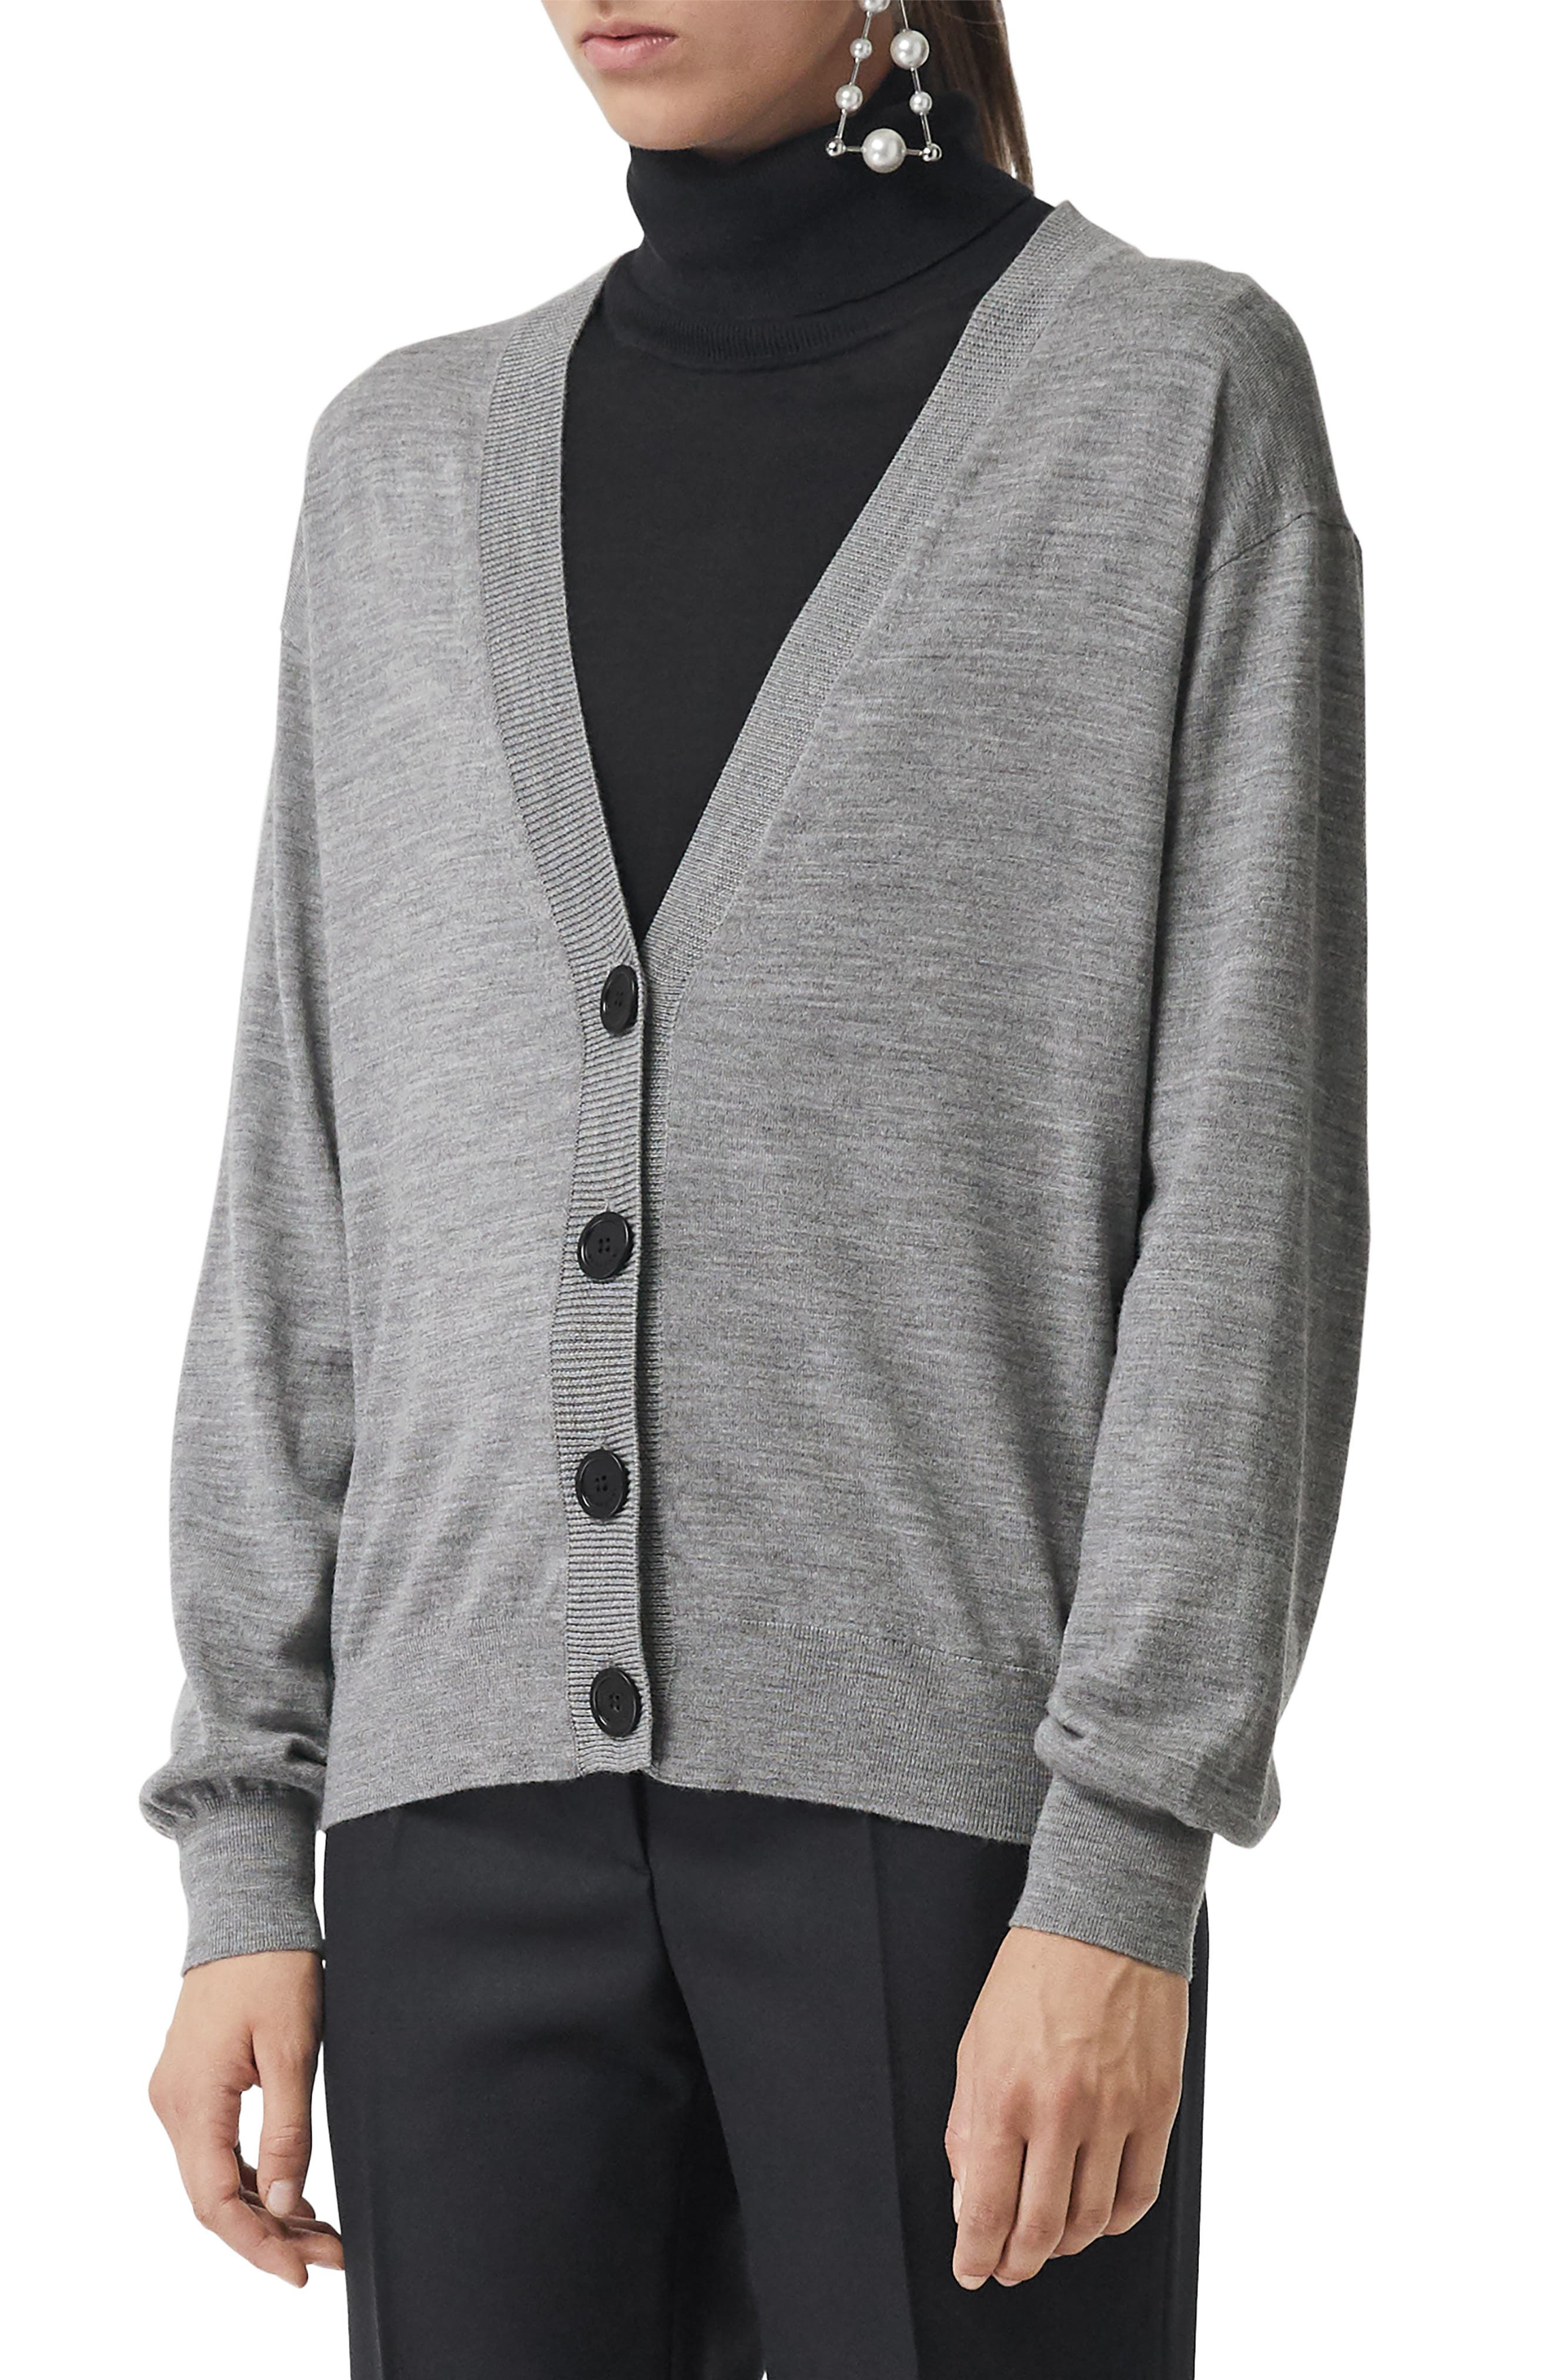 Burberry Dornoch Check Detail Merino Wool Cardigan, Grey